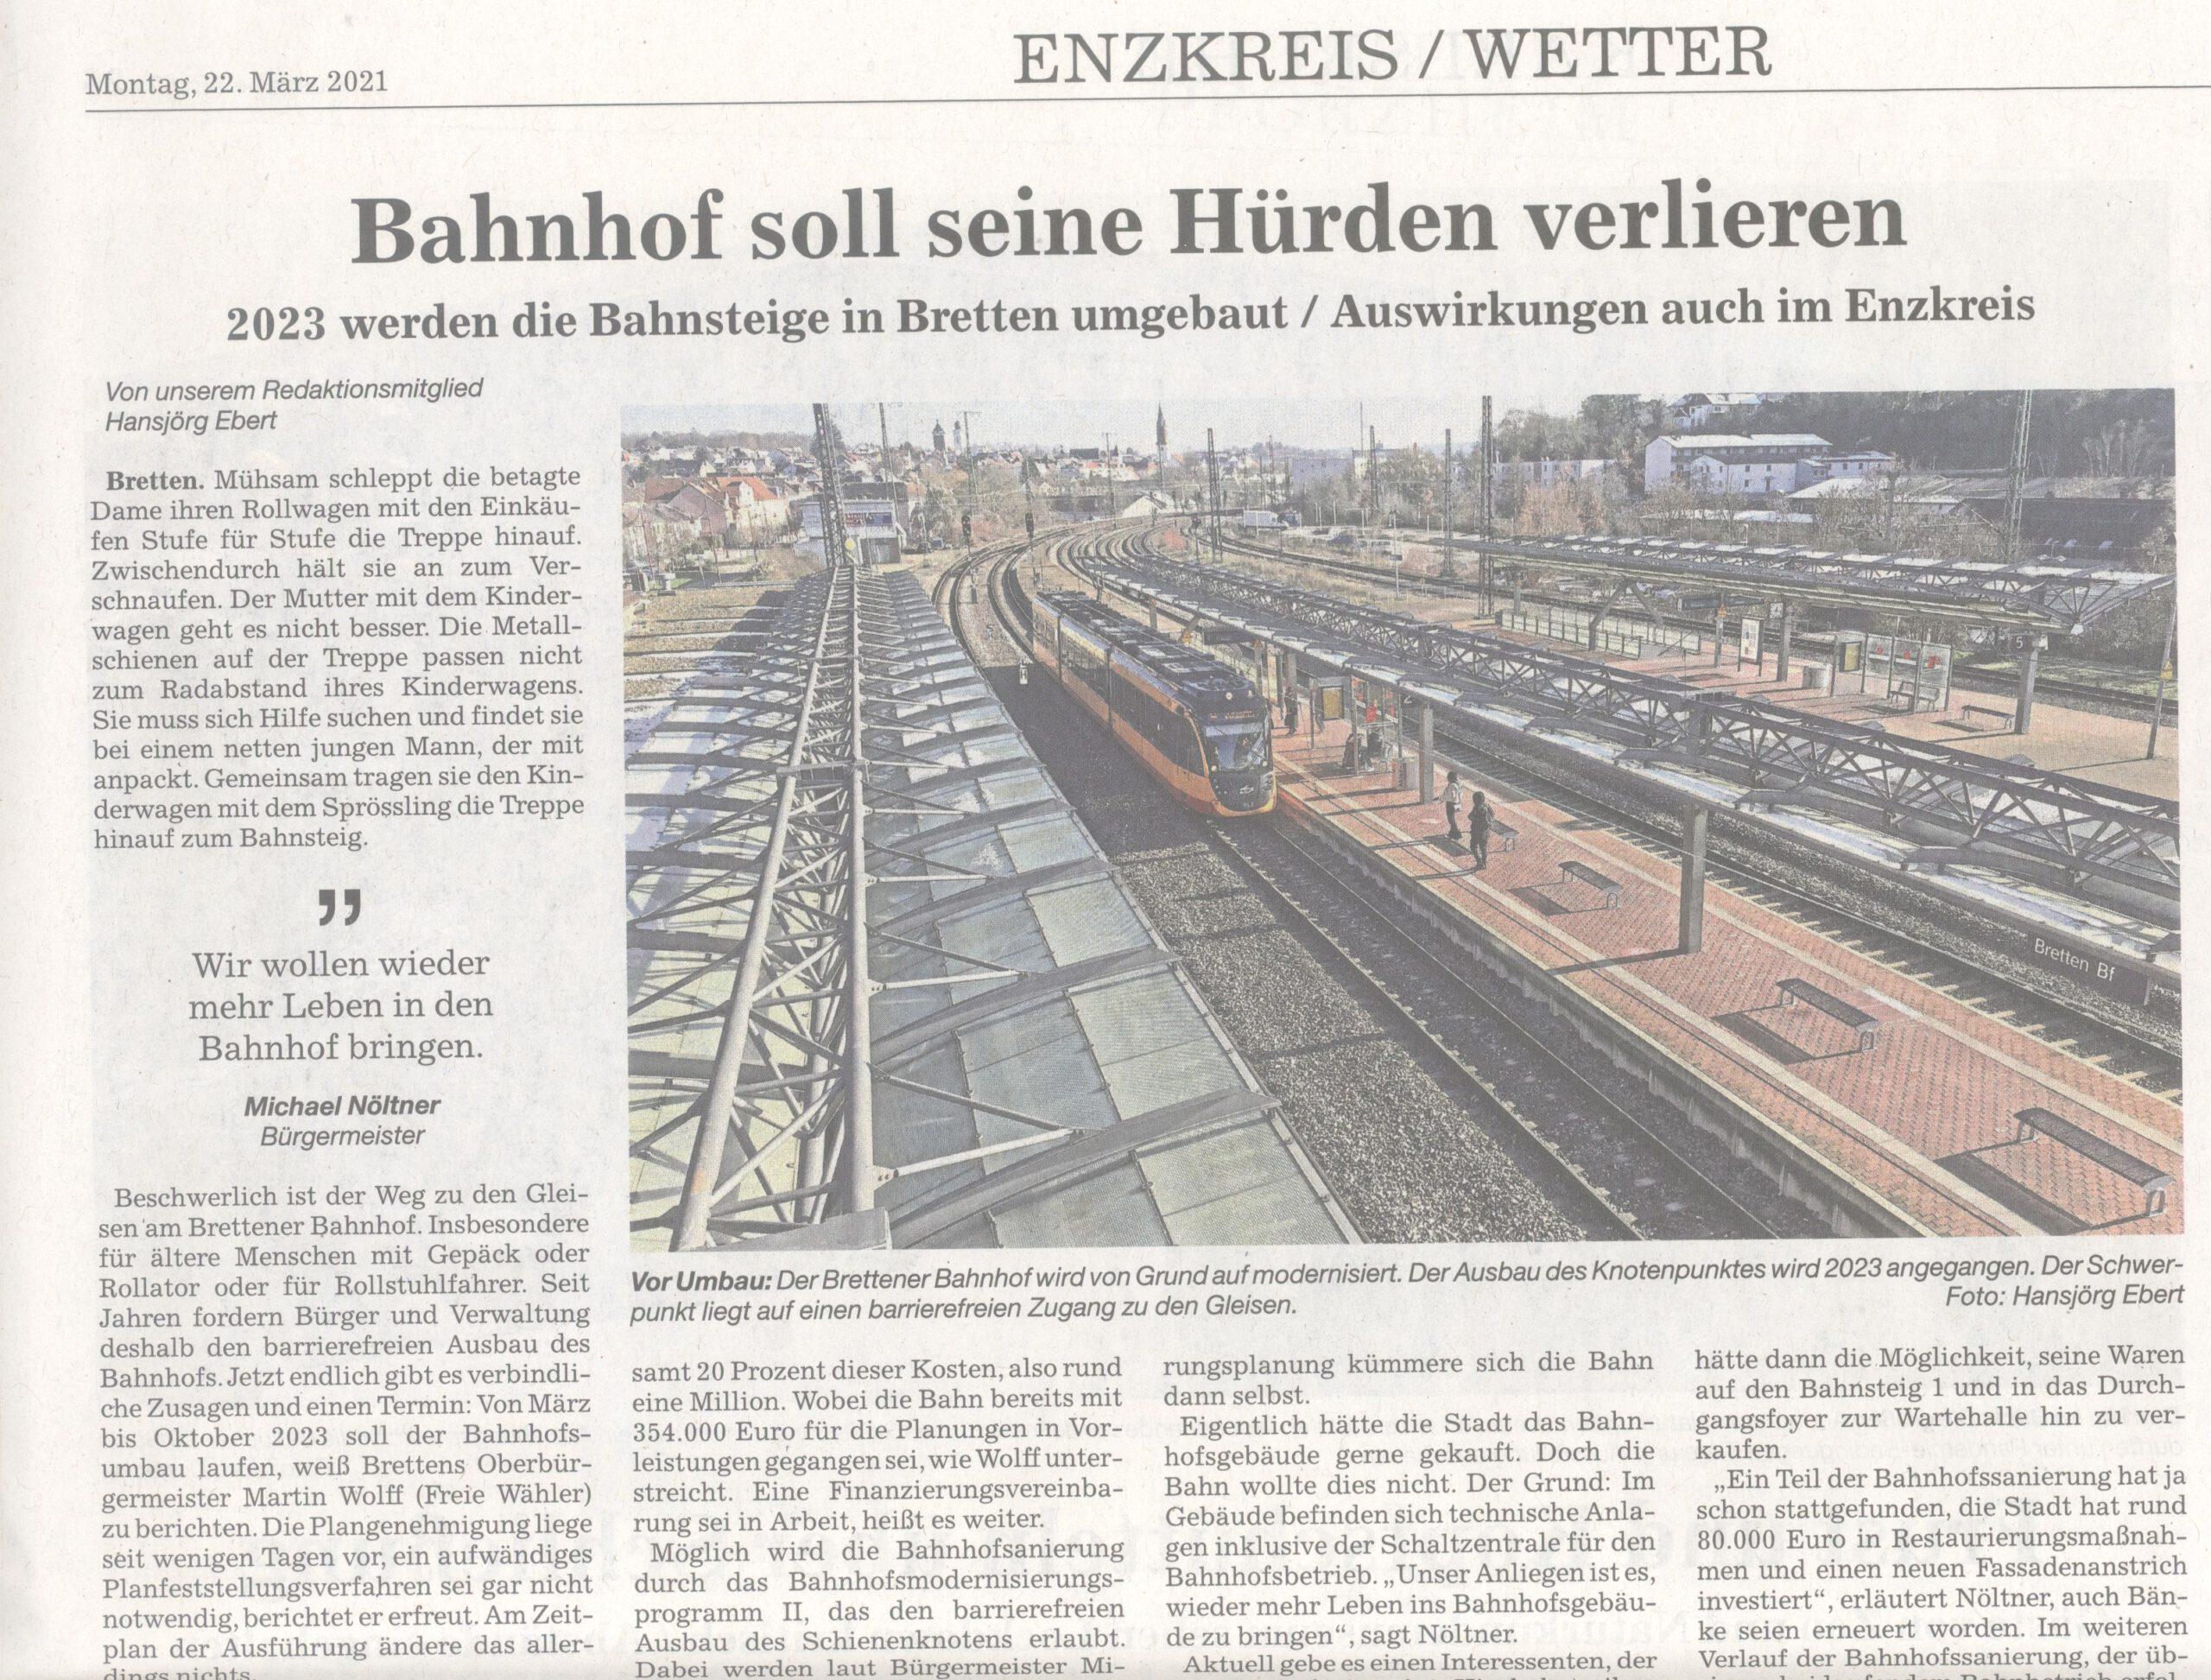 Bahnhof in Bretten soll barrierefrei umgebaut werden bis 2023